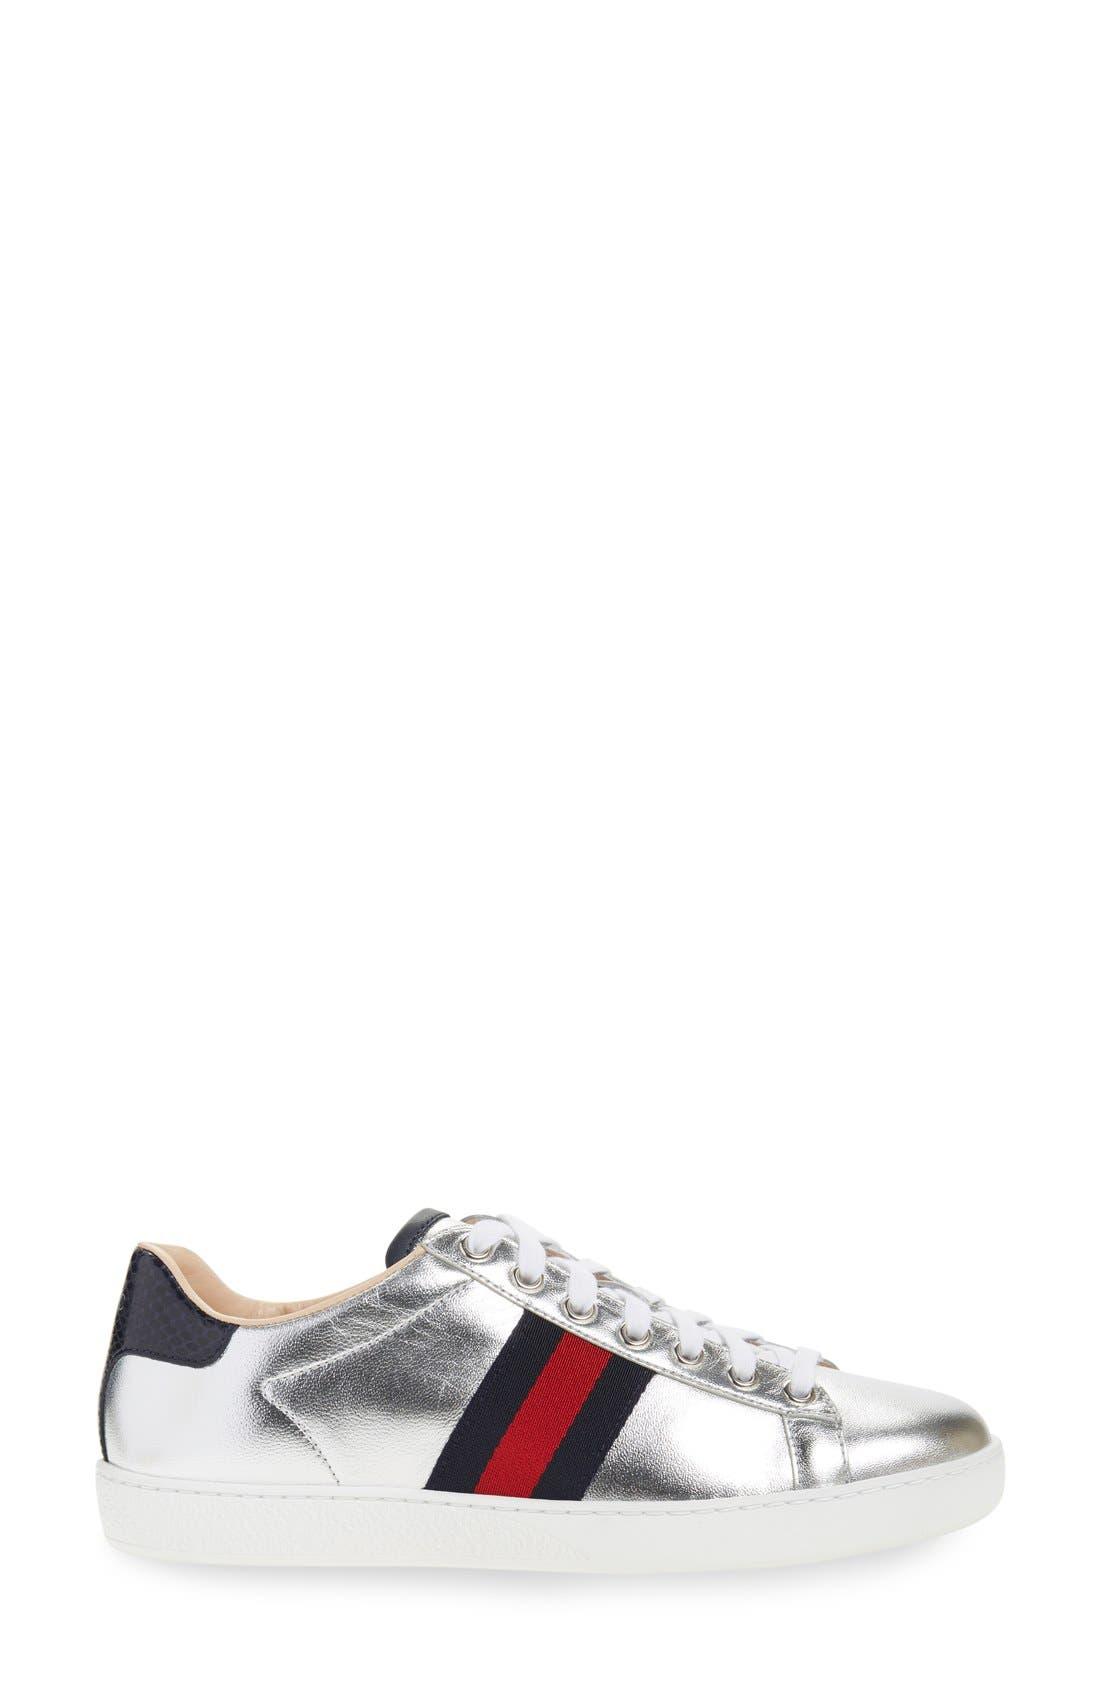 Alternate Image 4  - Gucci 'New Ace' Metallic Low Top Sneaker (Women)